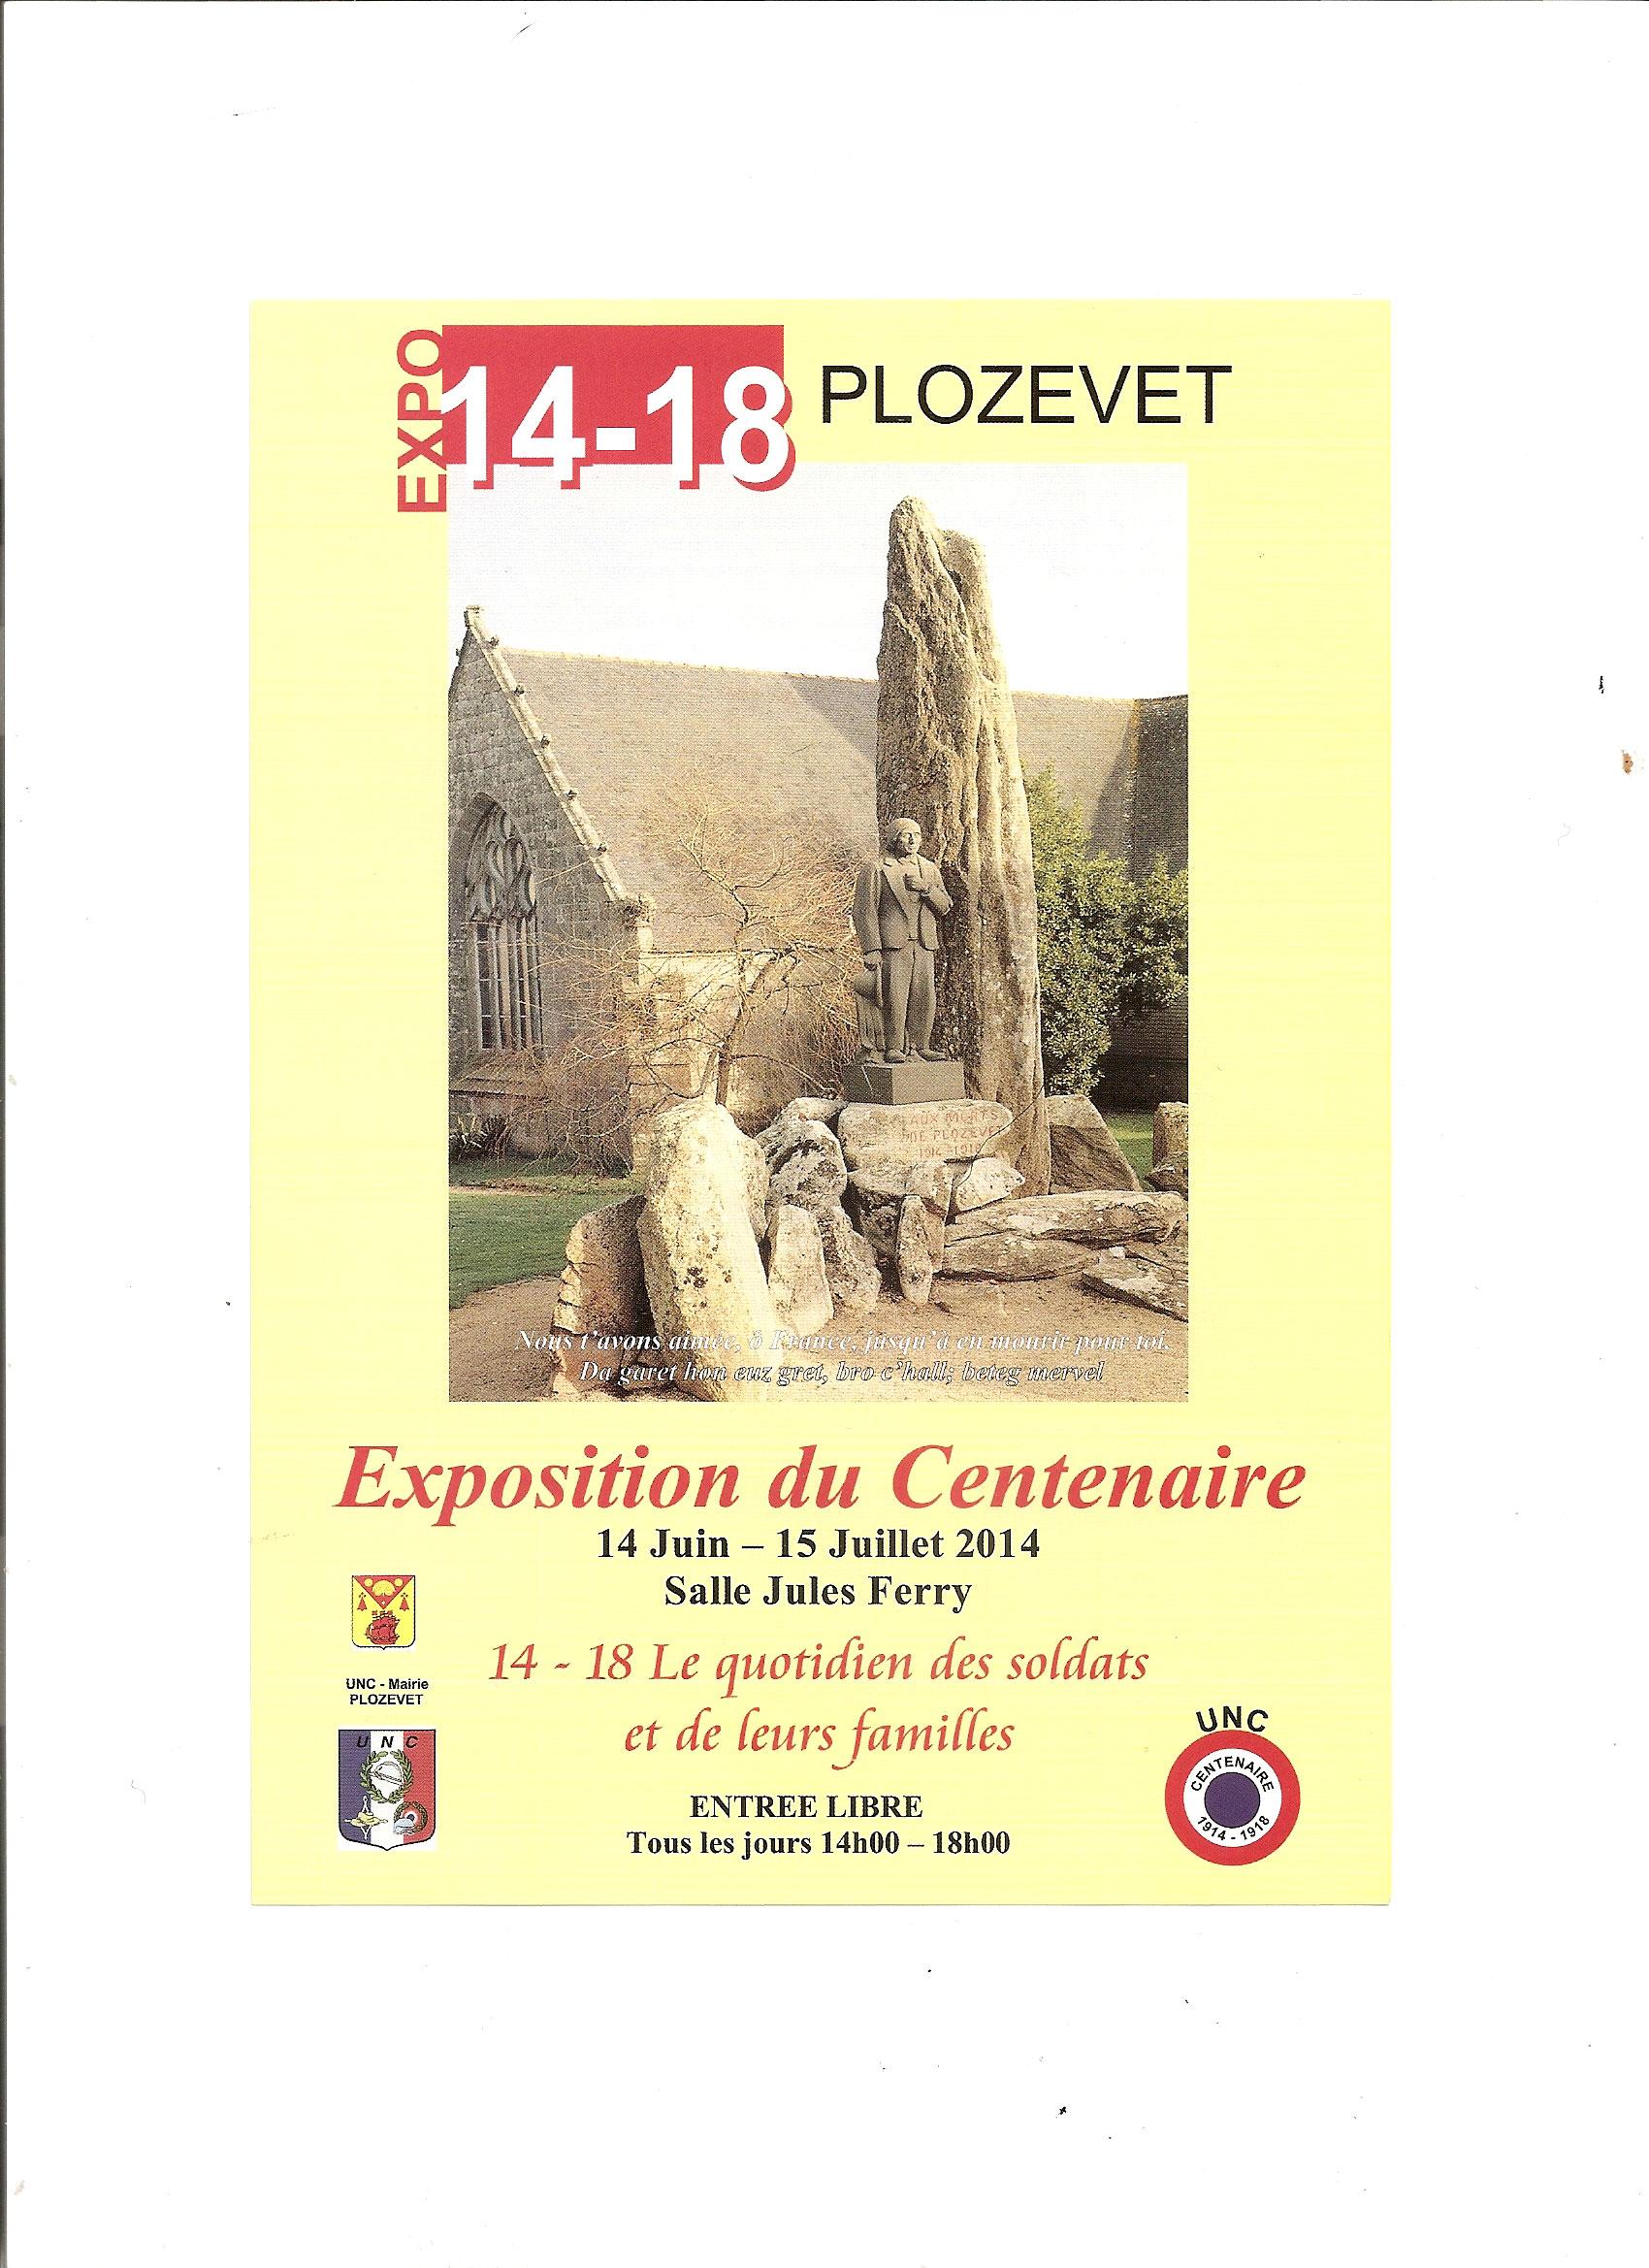 Expo  Plozévet